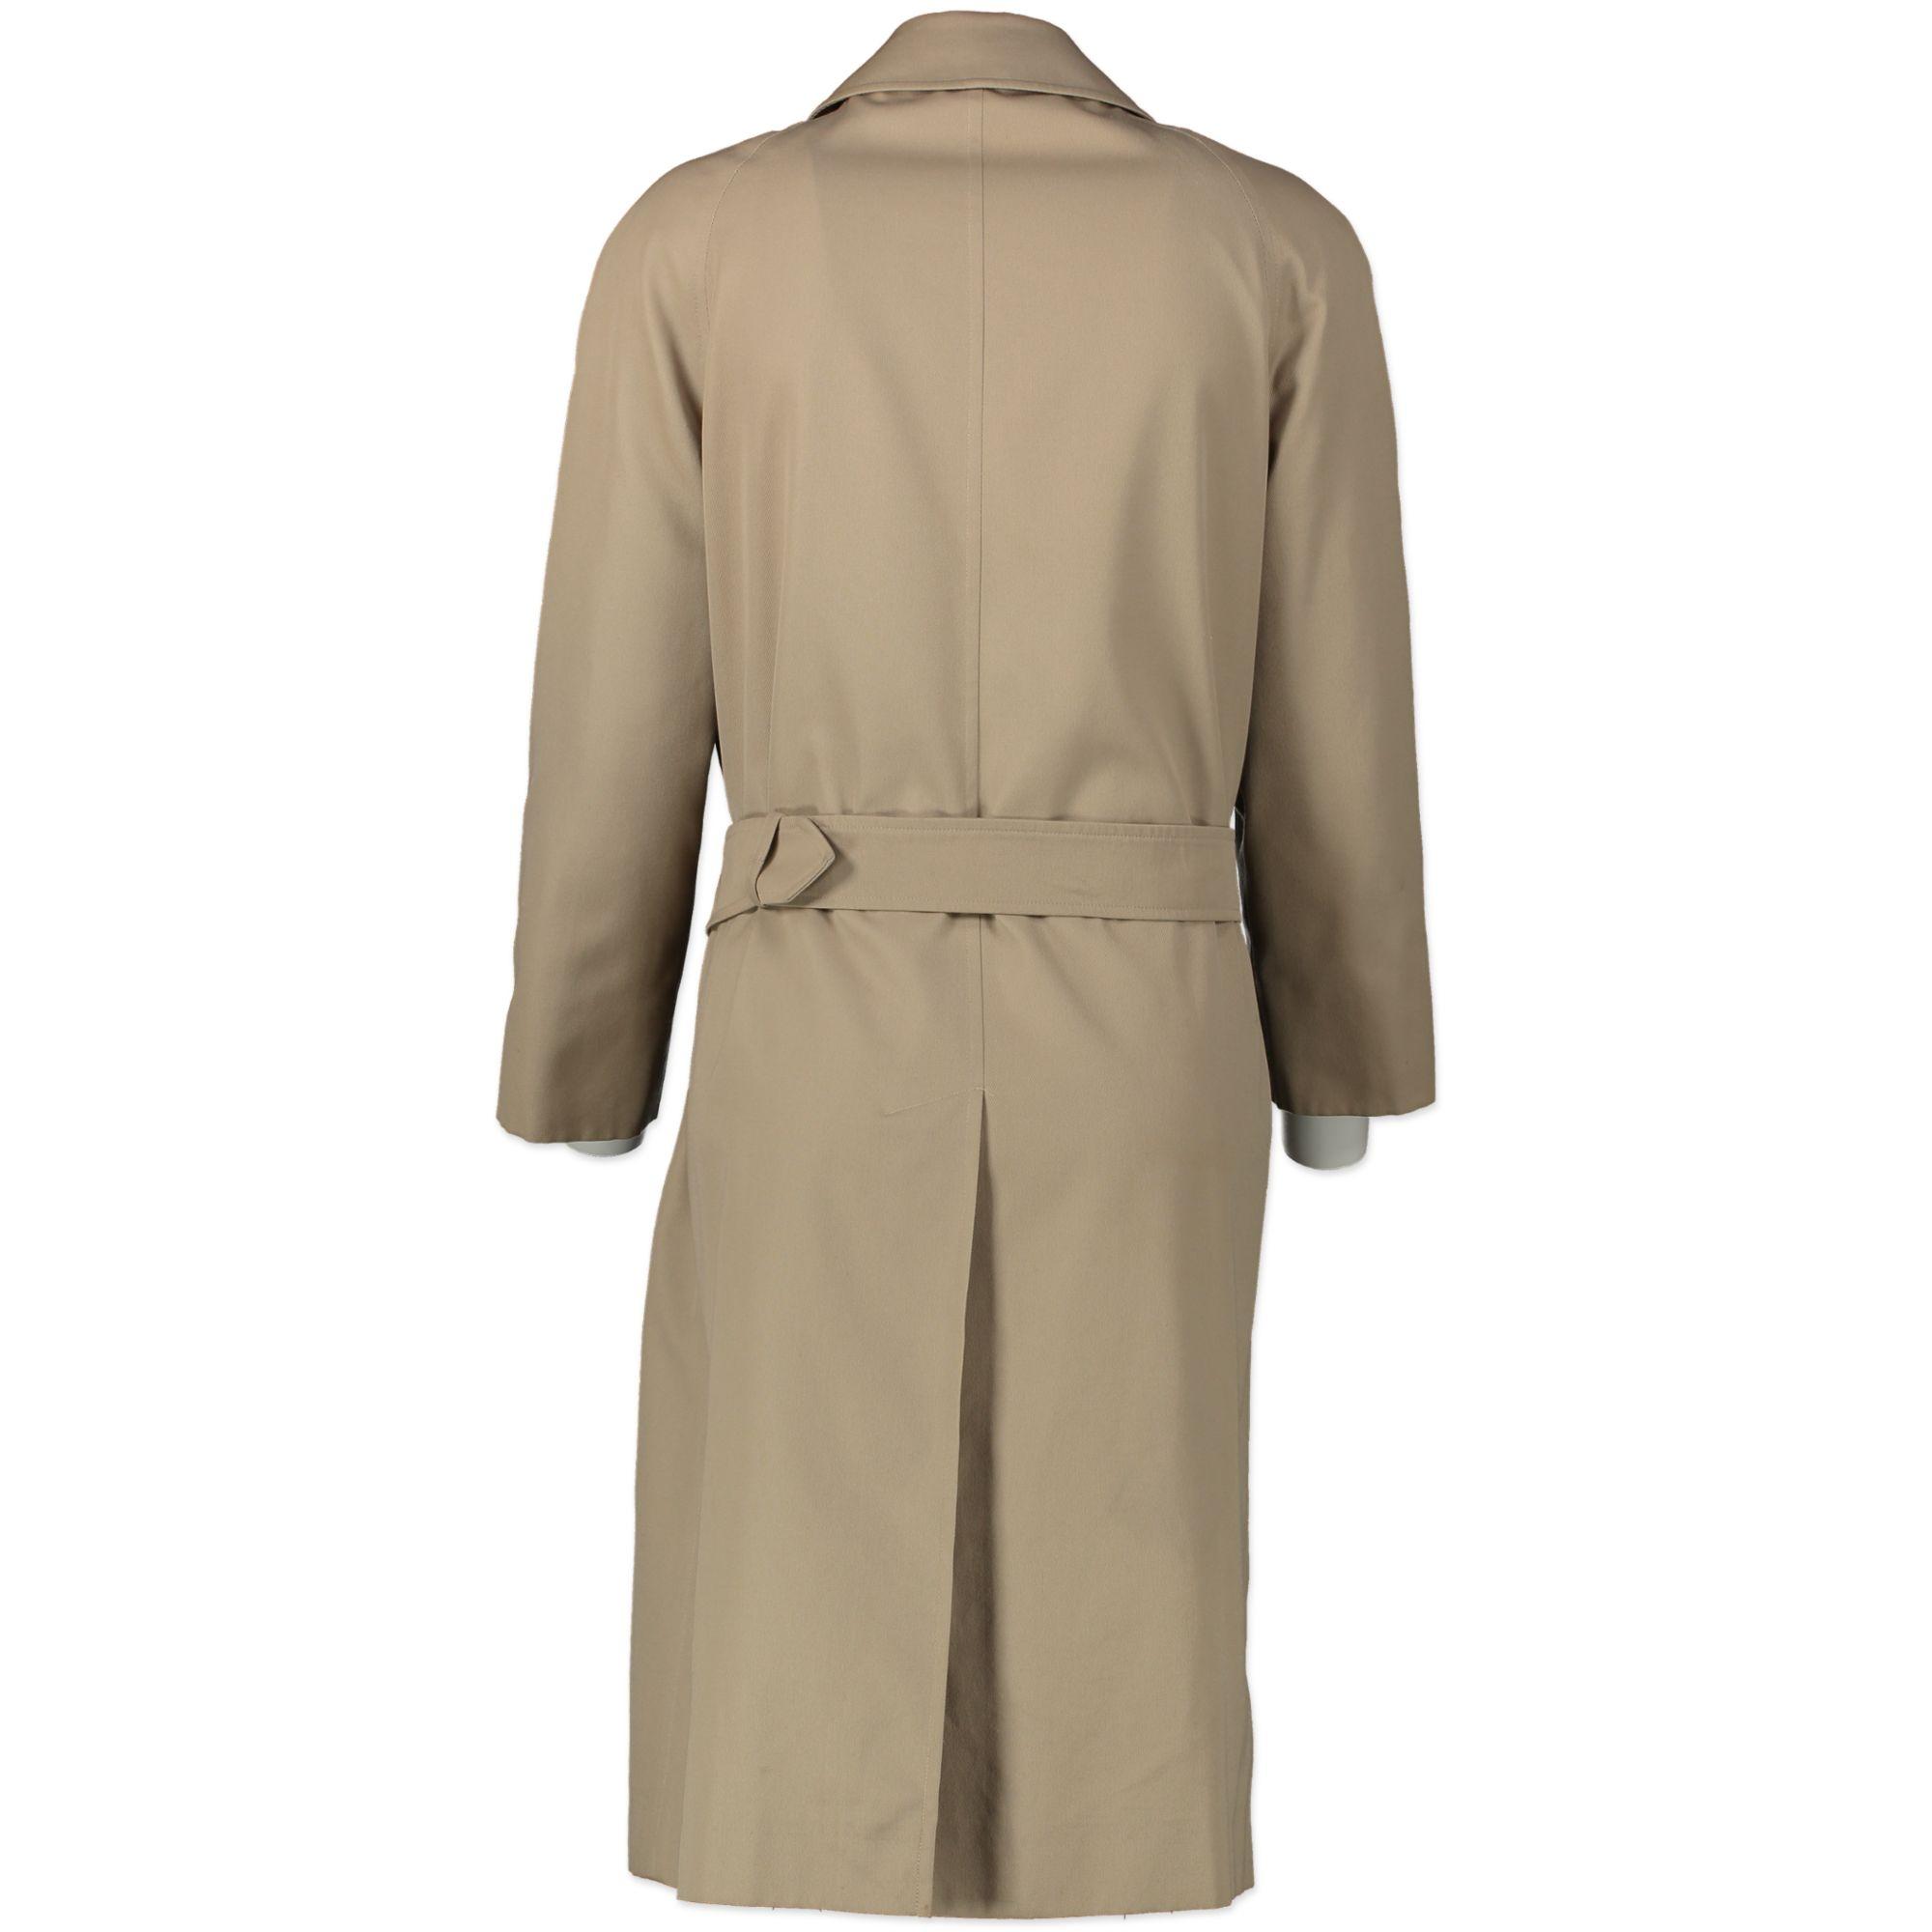 Burberry Beige Trenchcoat - size UK8